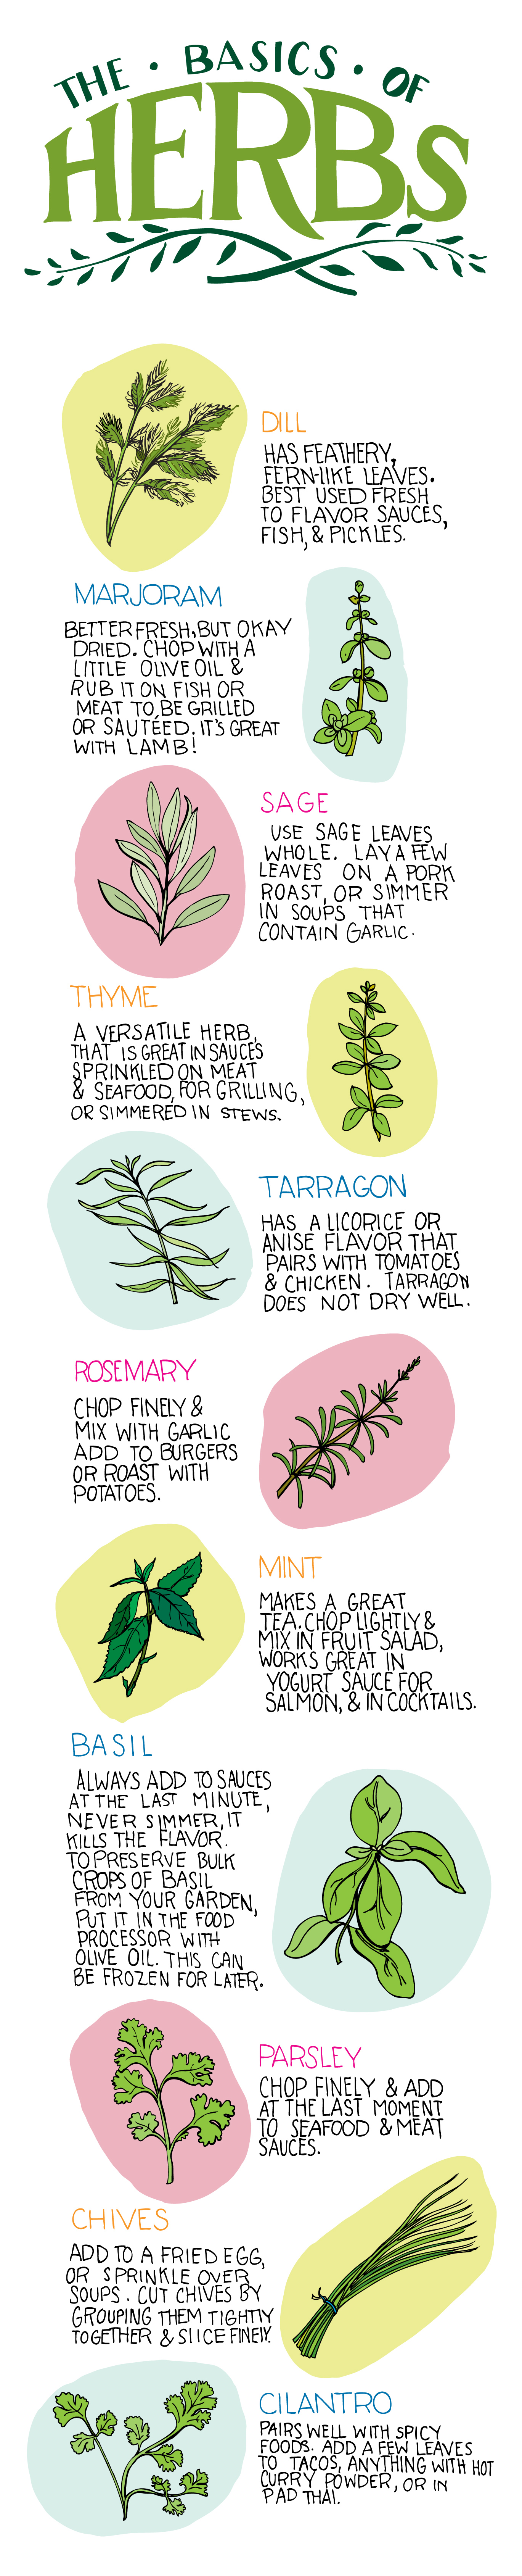 Basics of Herbs